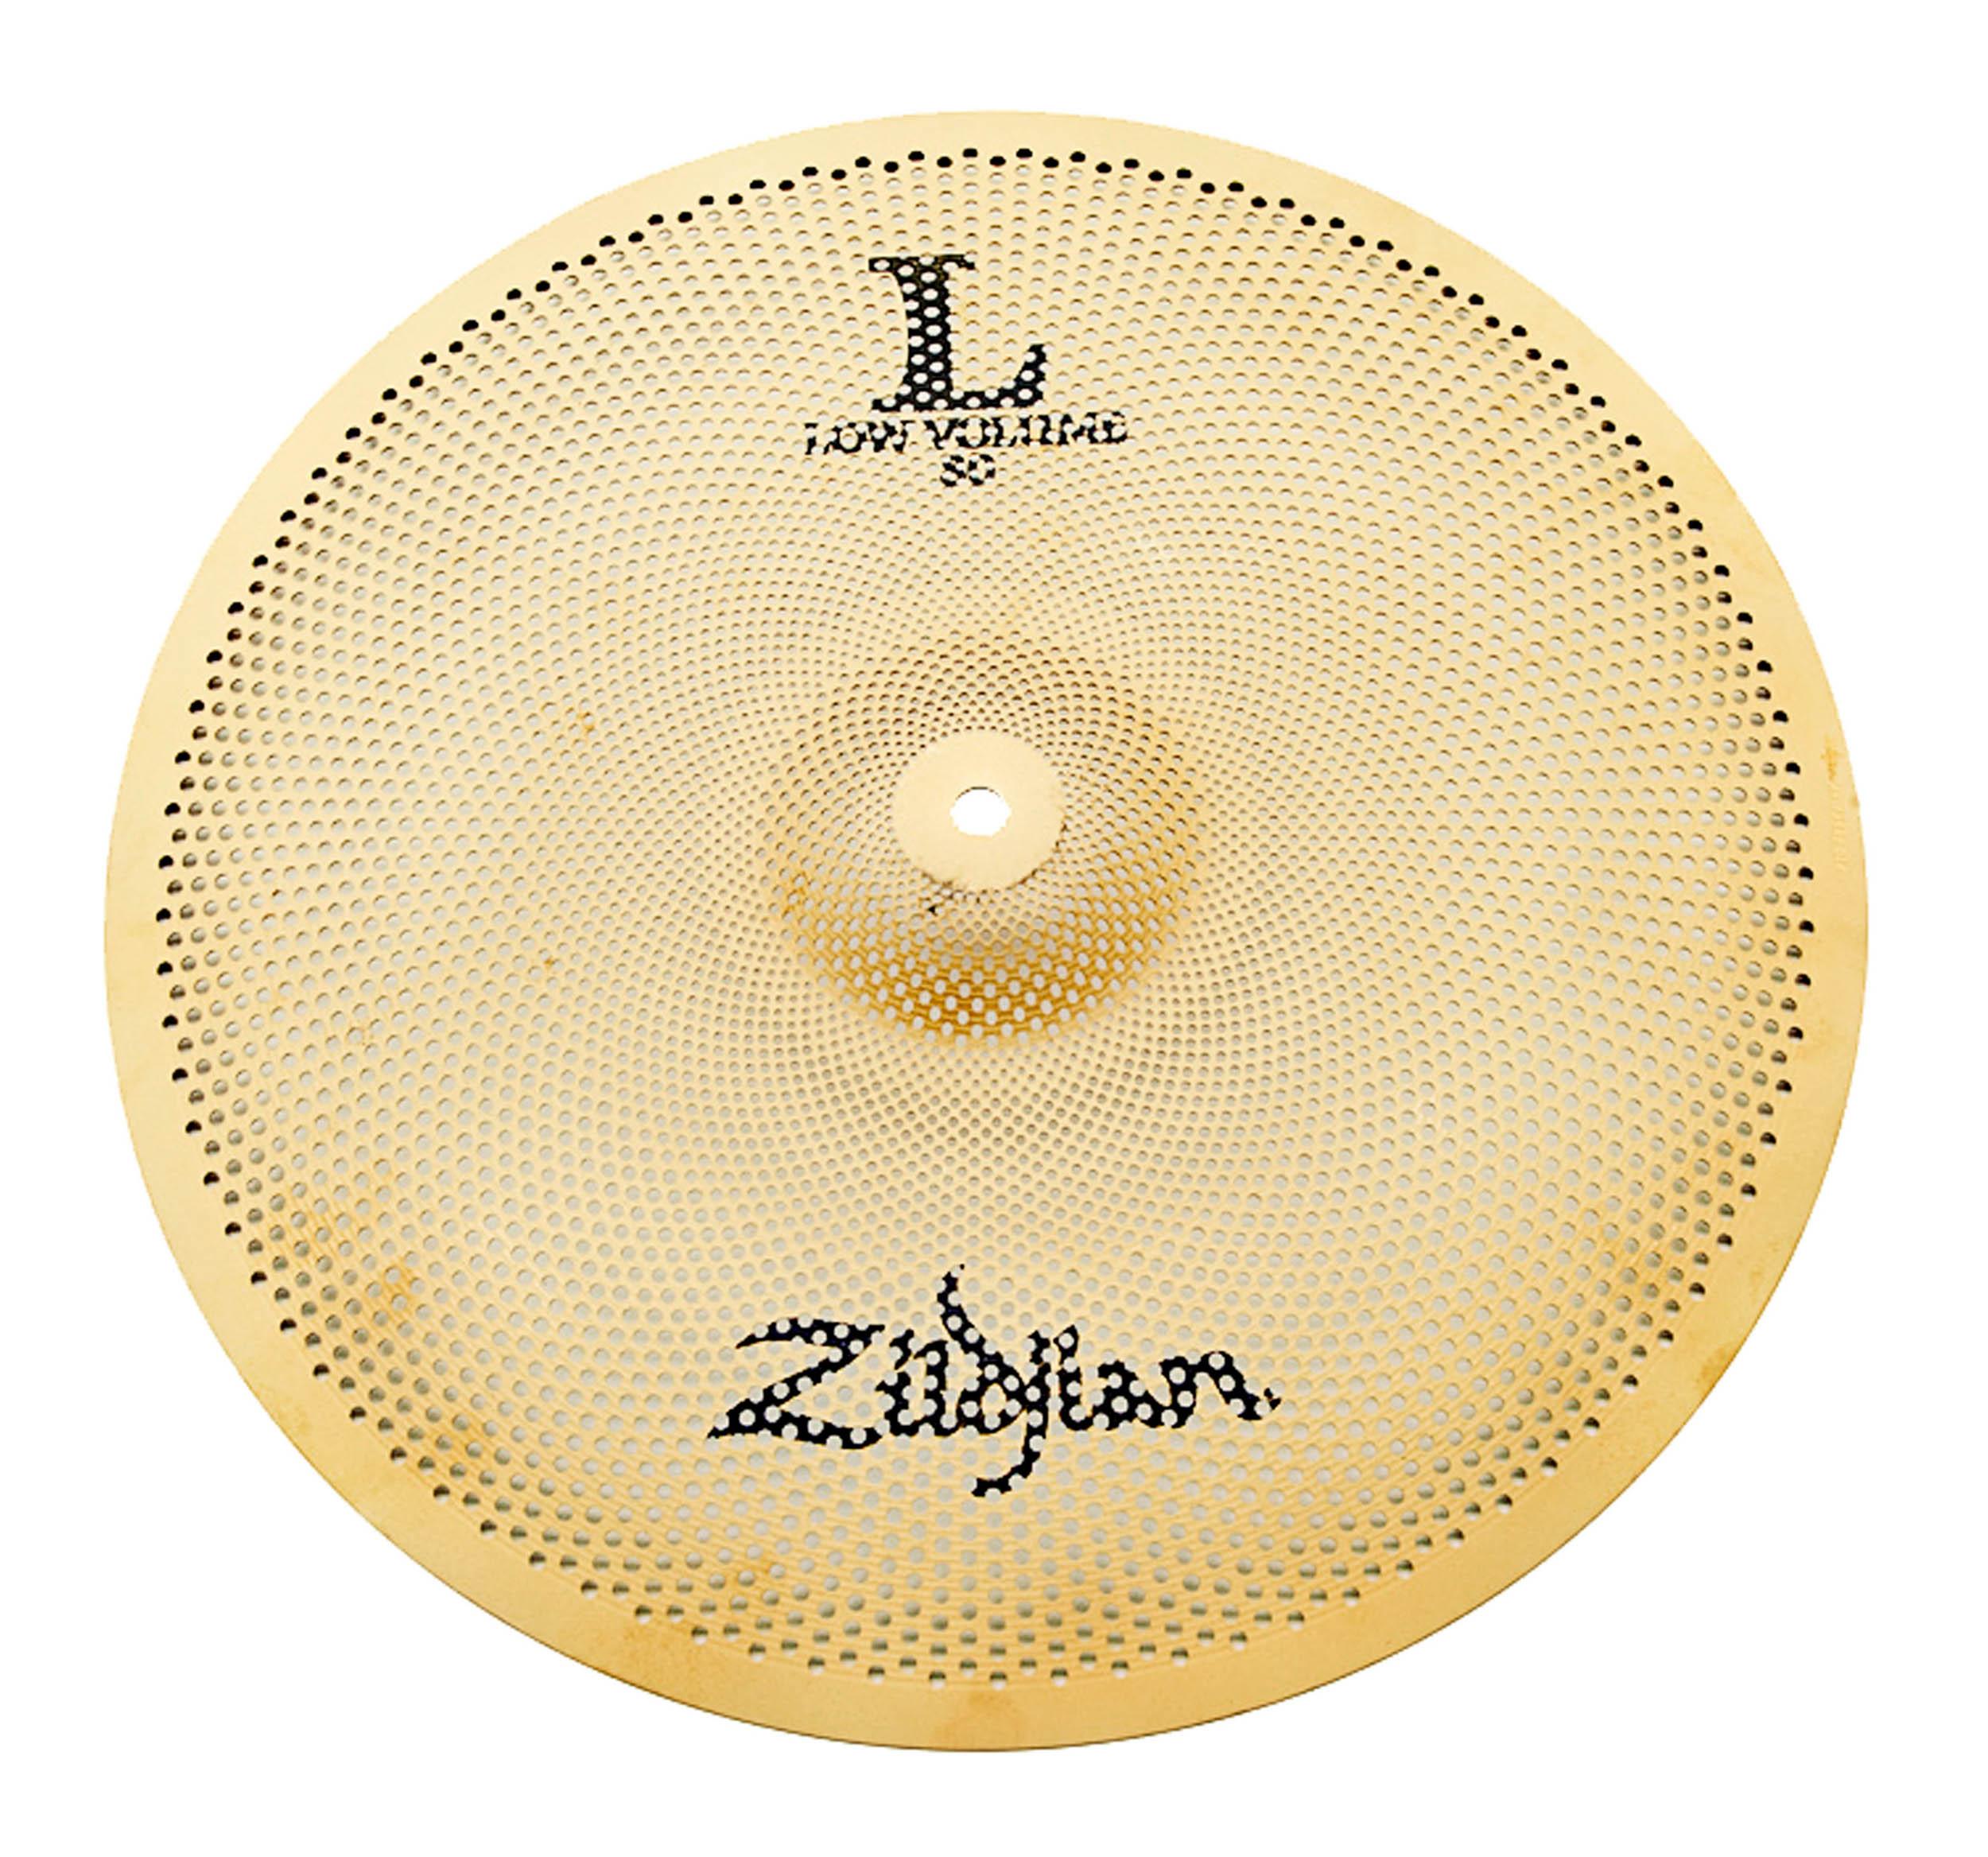 zilv14c zildjian l80 low volume 14 crash special deal drum tec. Black Bedroom Furniture Sets. Home Design Ideas